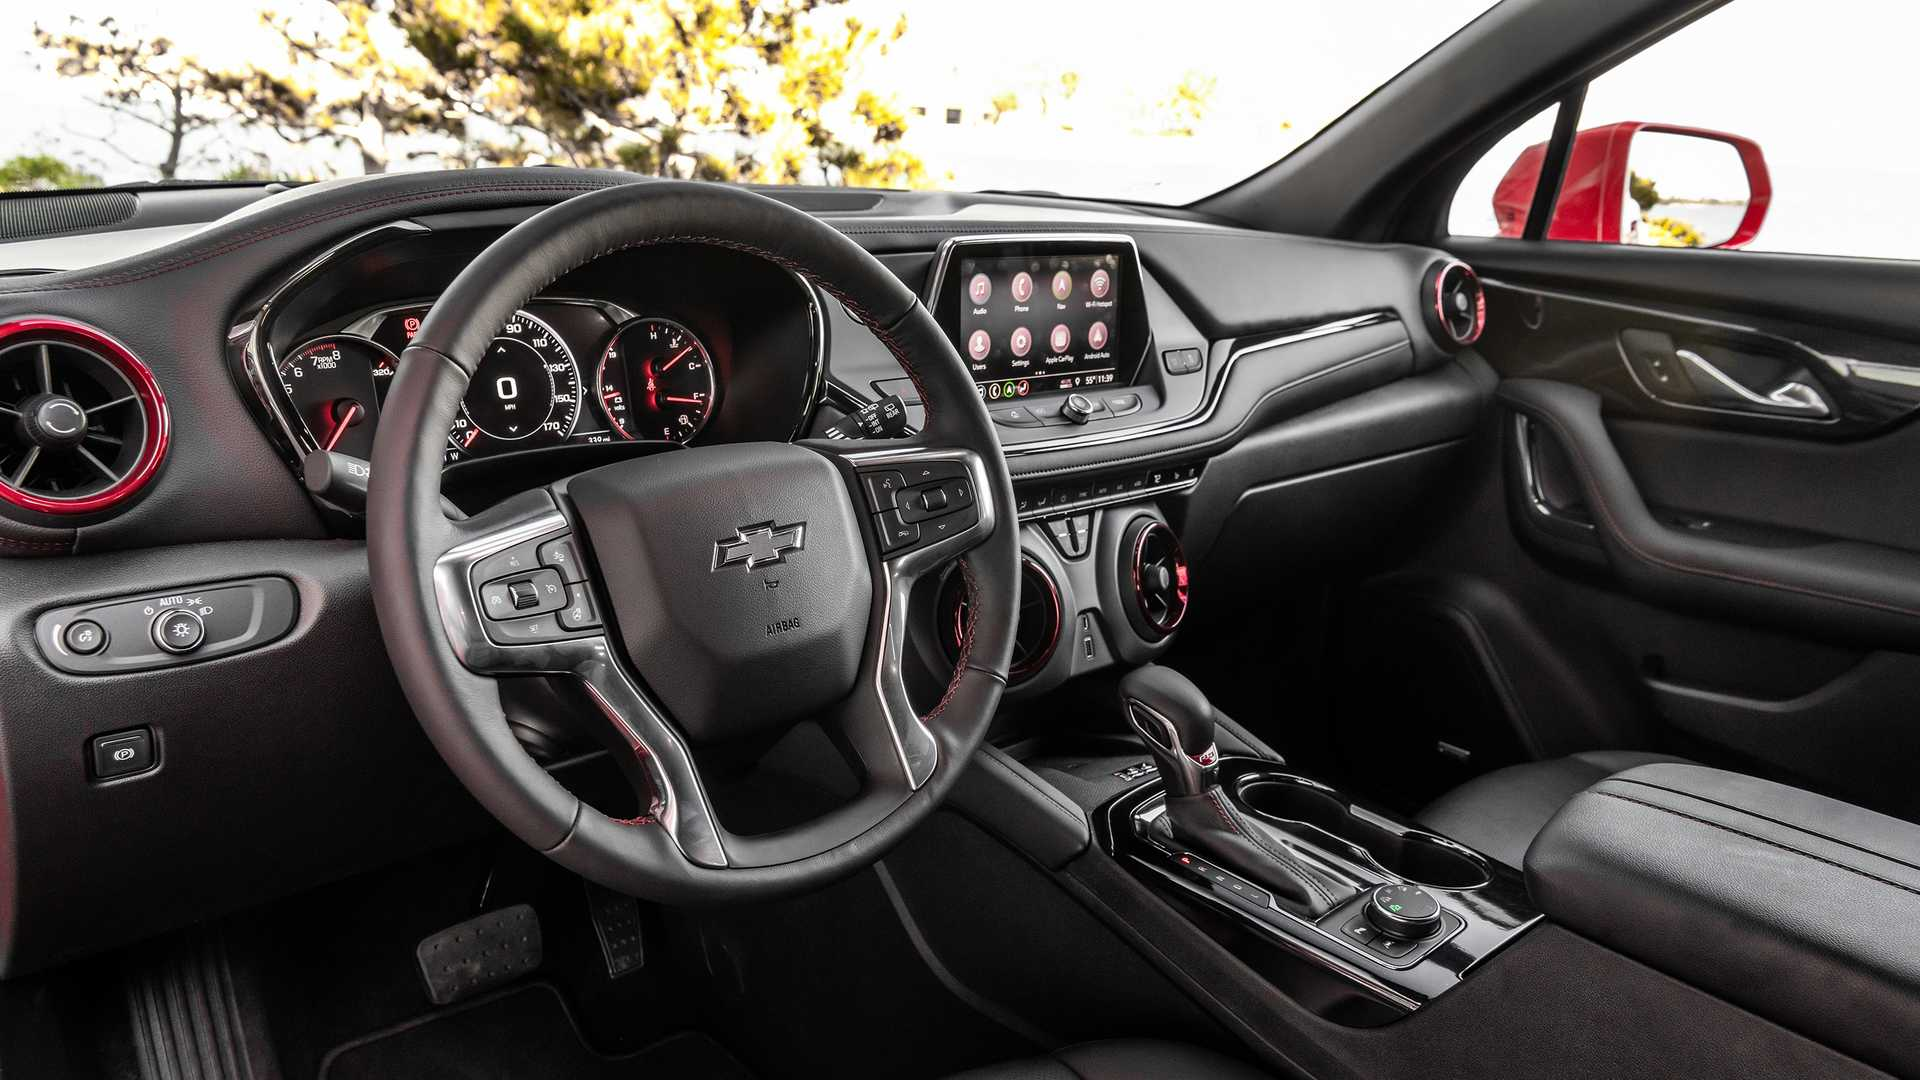 2019-chevrolet-blazer-first-drive-danh-gia-6.jpg